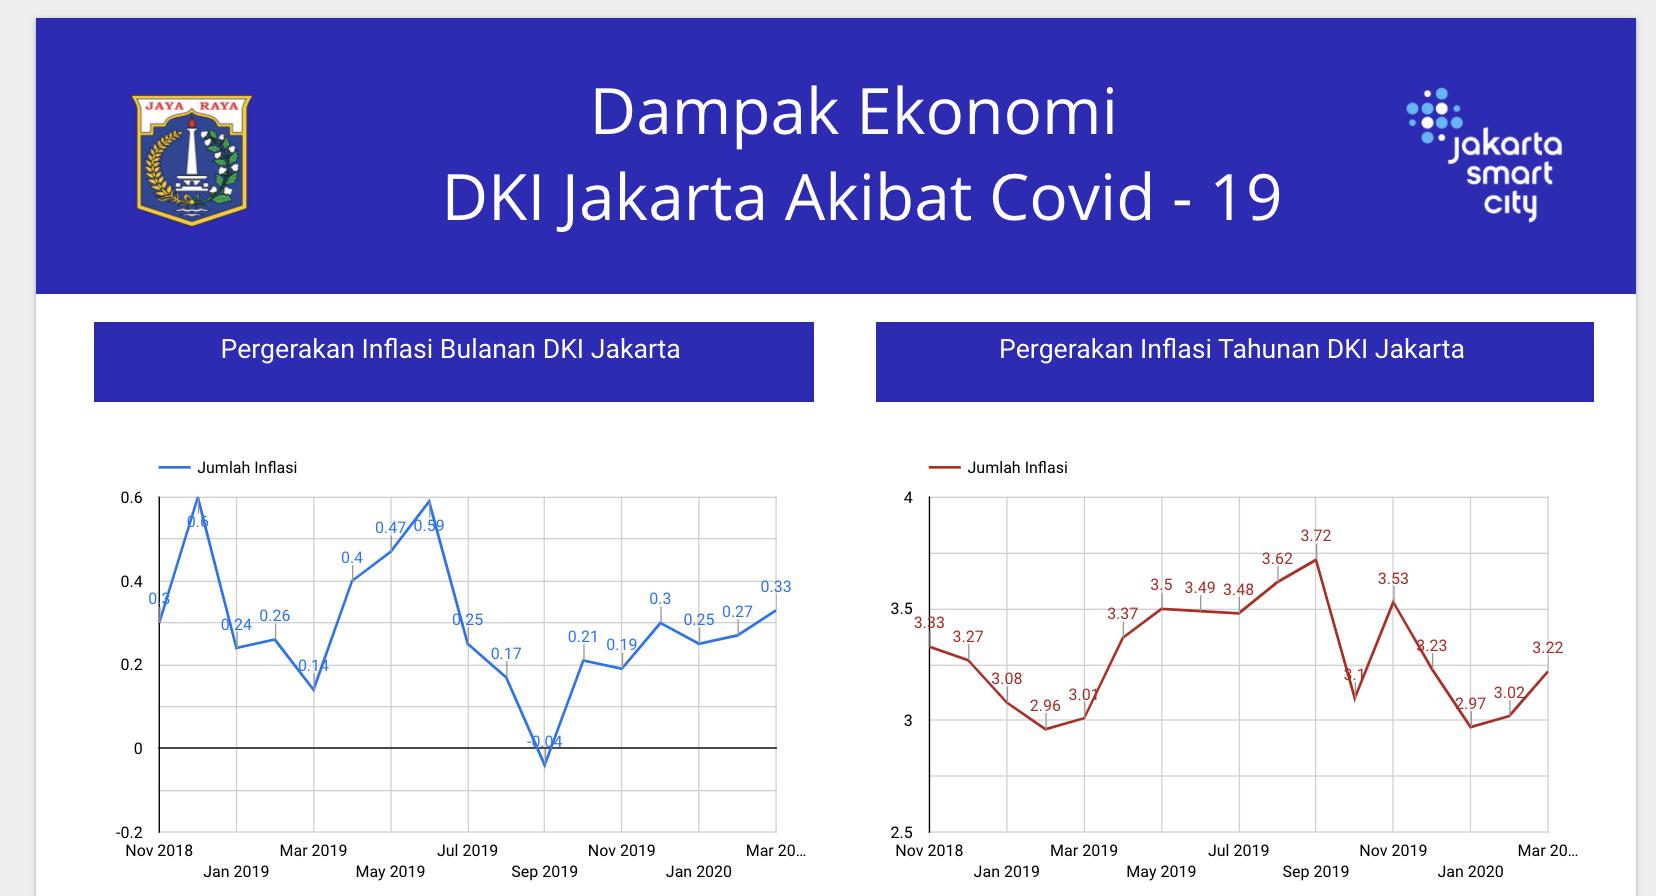 Dampak Ekonomi Terkait COVID-19